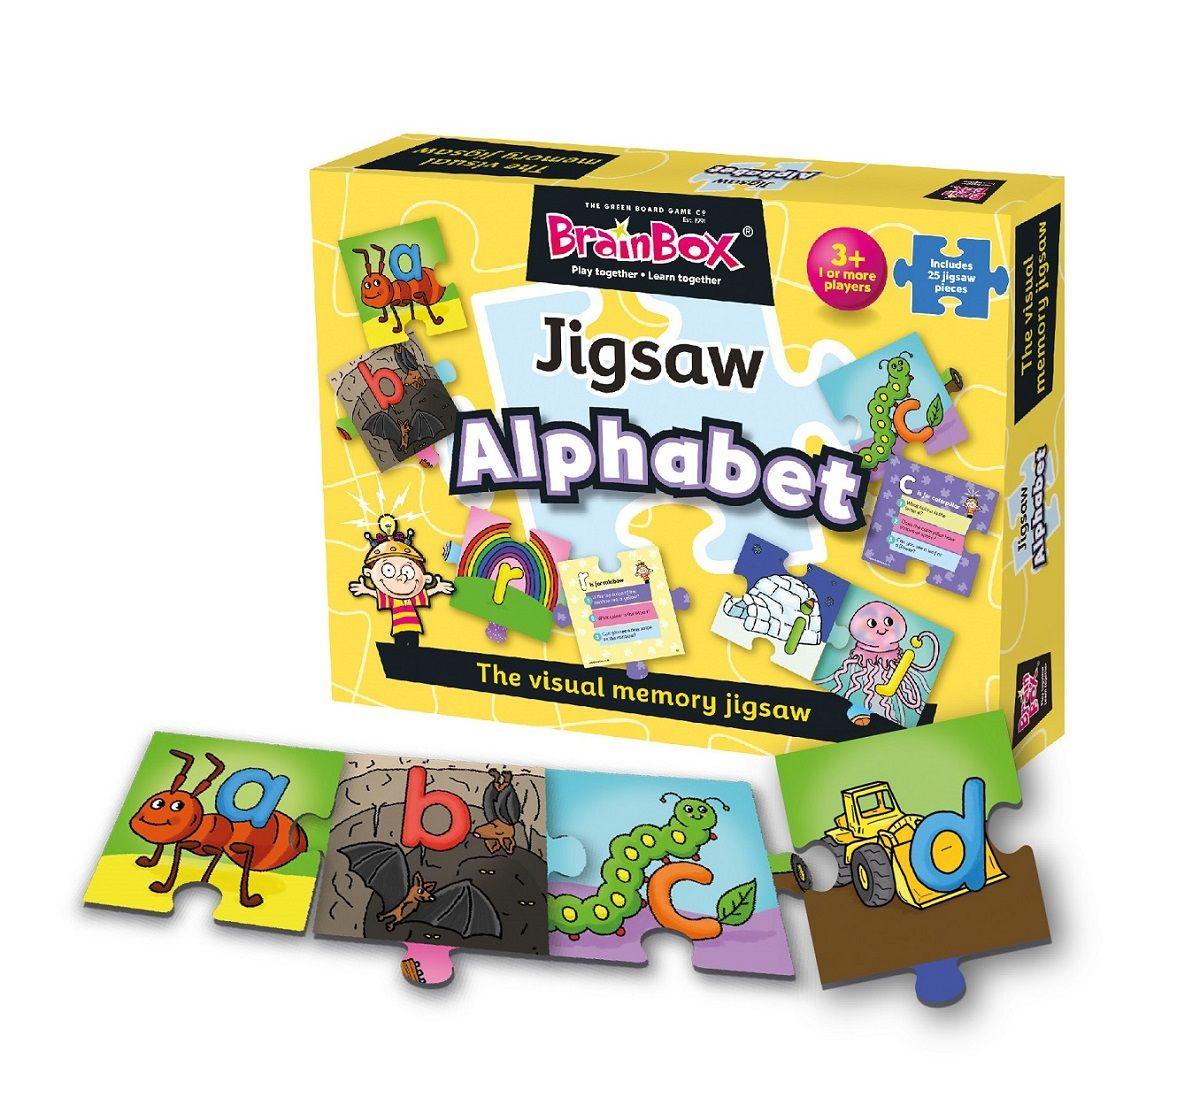 BrainBox Alphabet Jigsaw Little learners, Alphabet